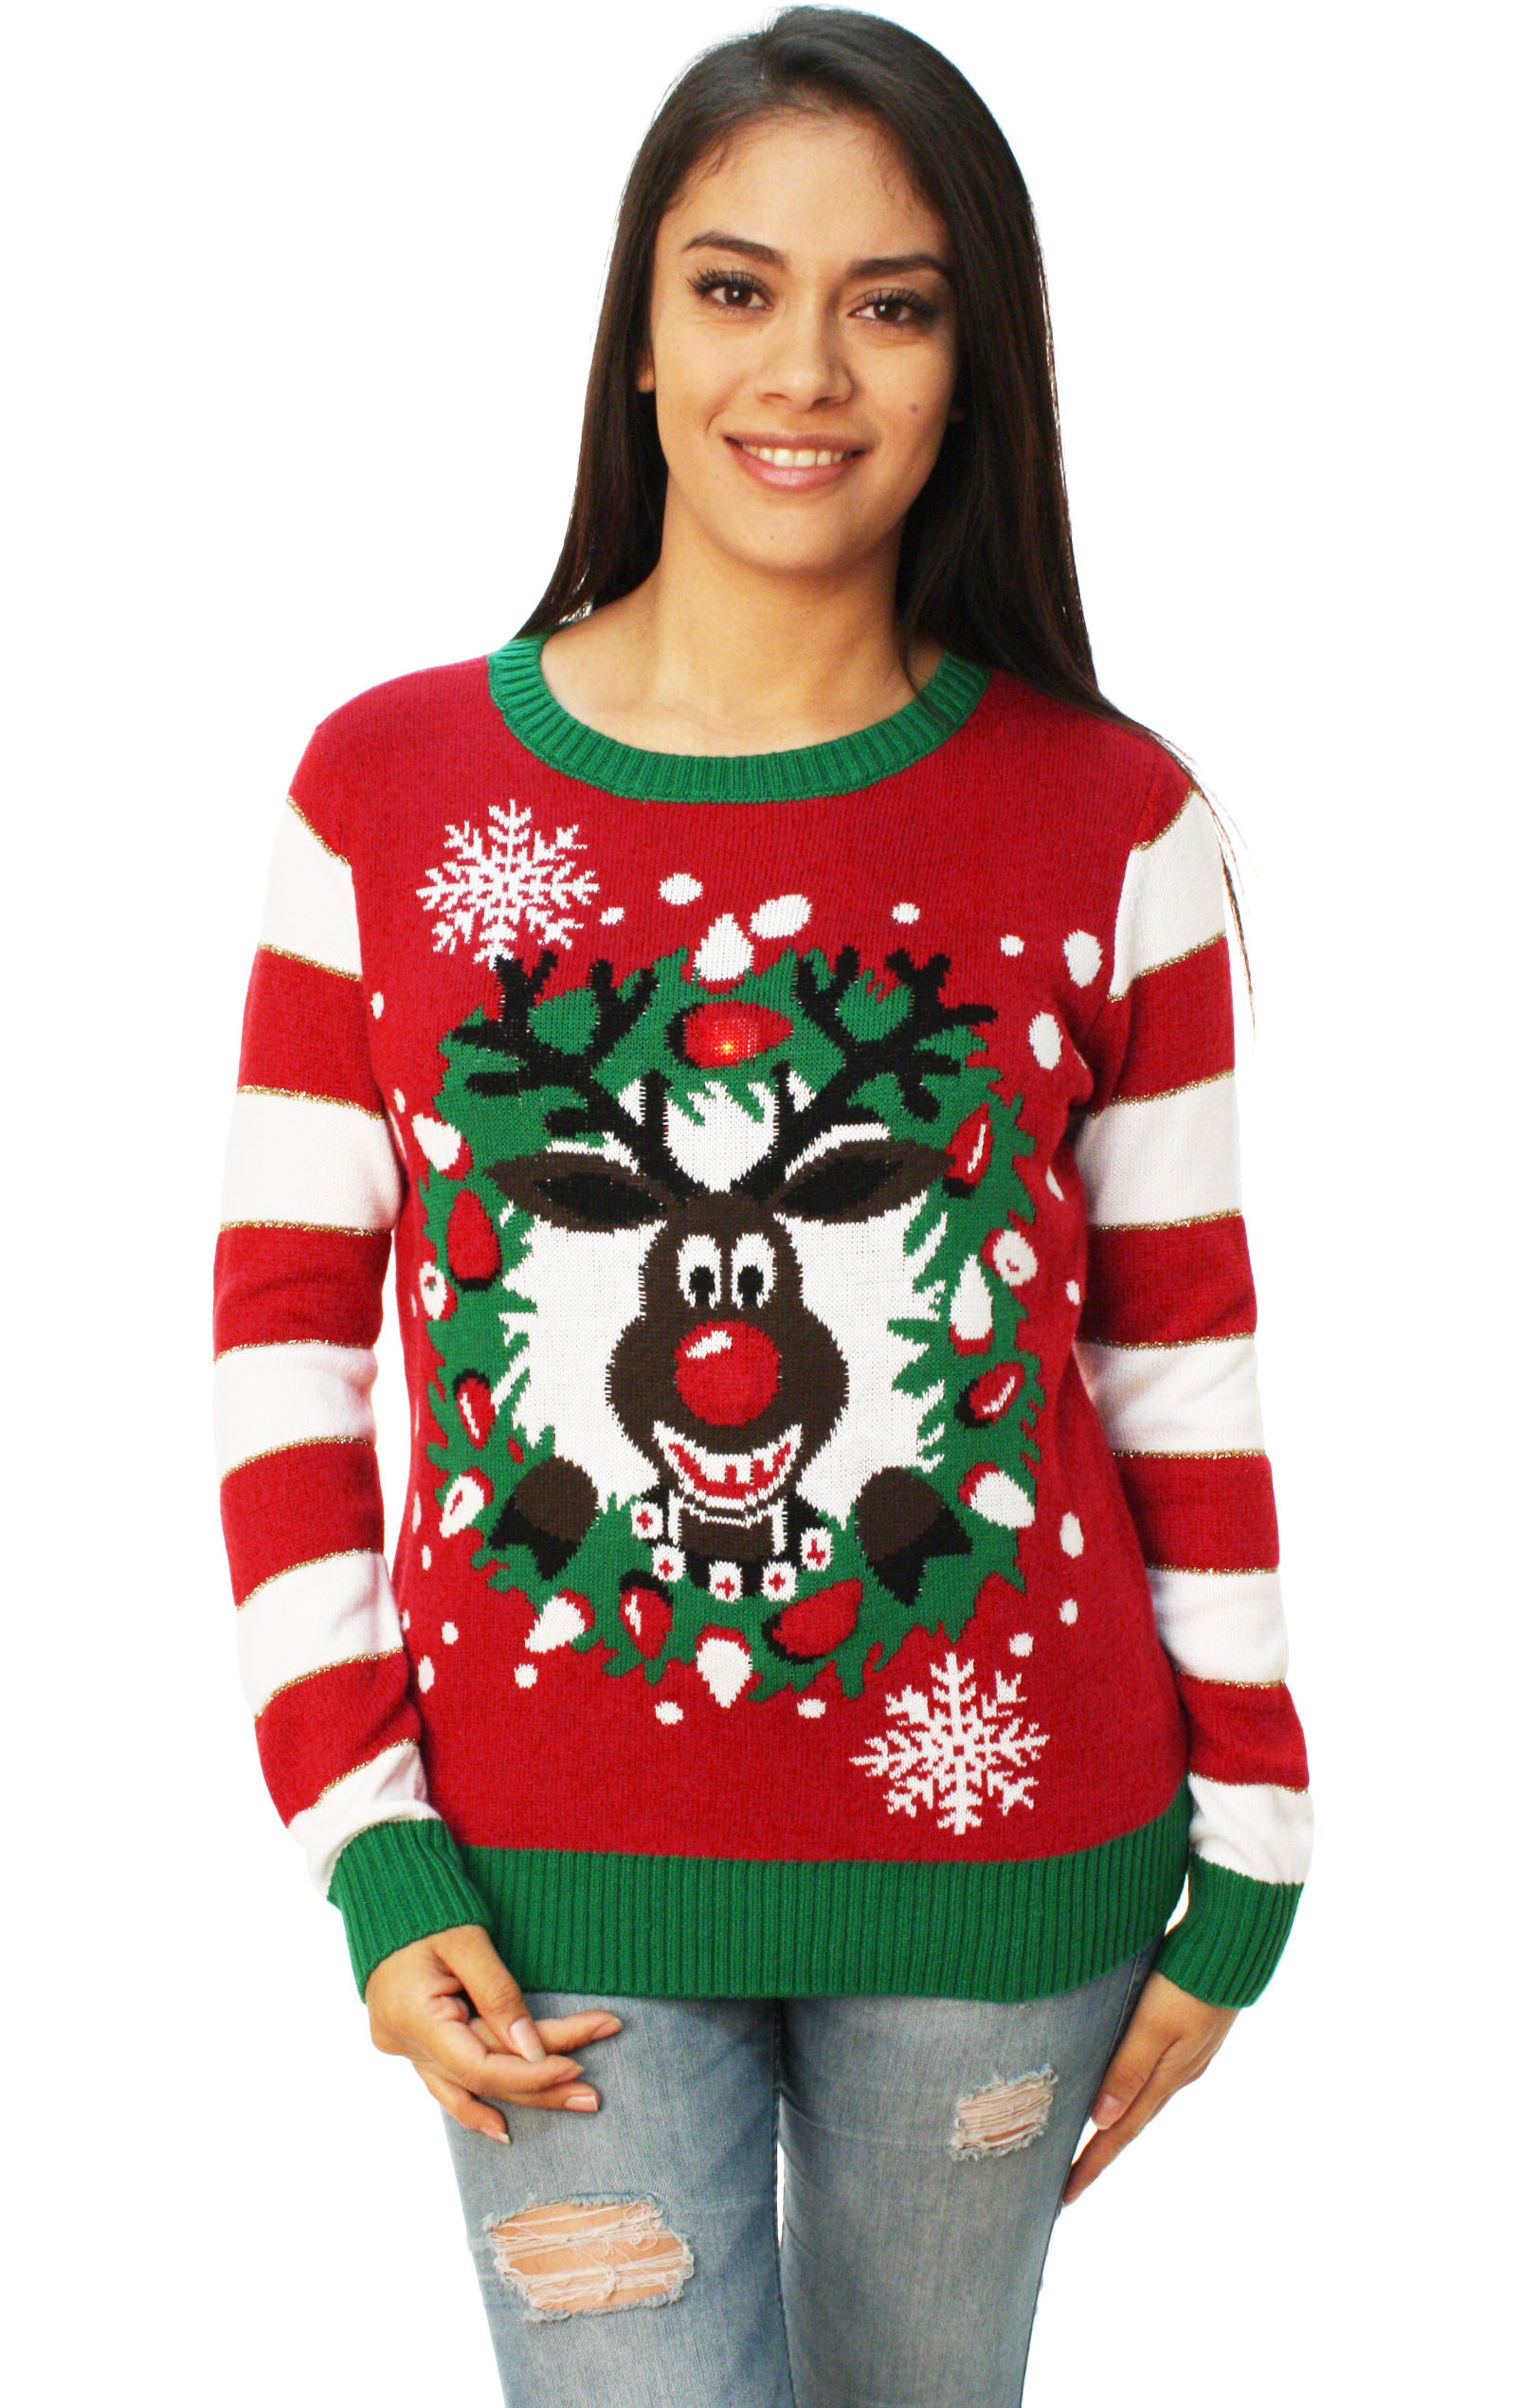 Ugly Christmas Sweater - Ugly Christmas Sweater Women's Rudolph LED